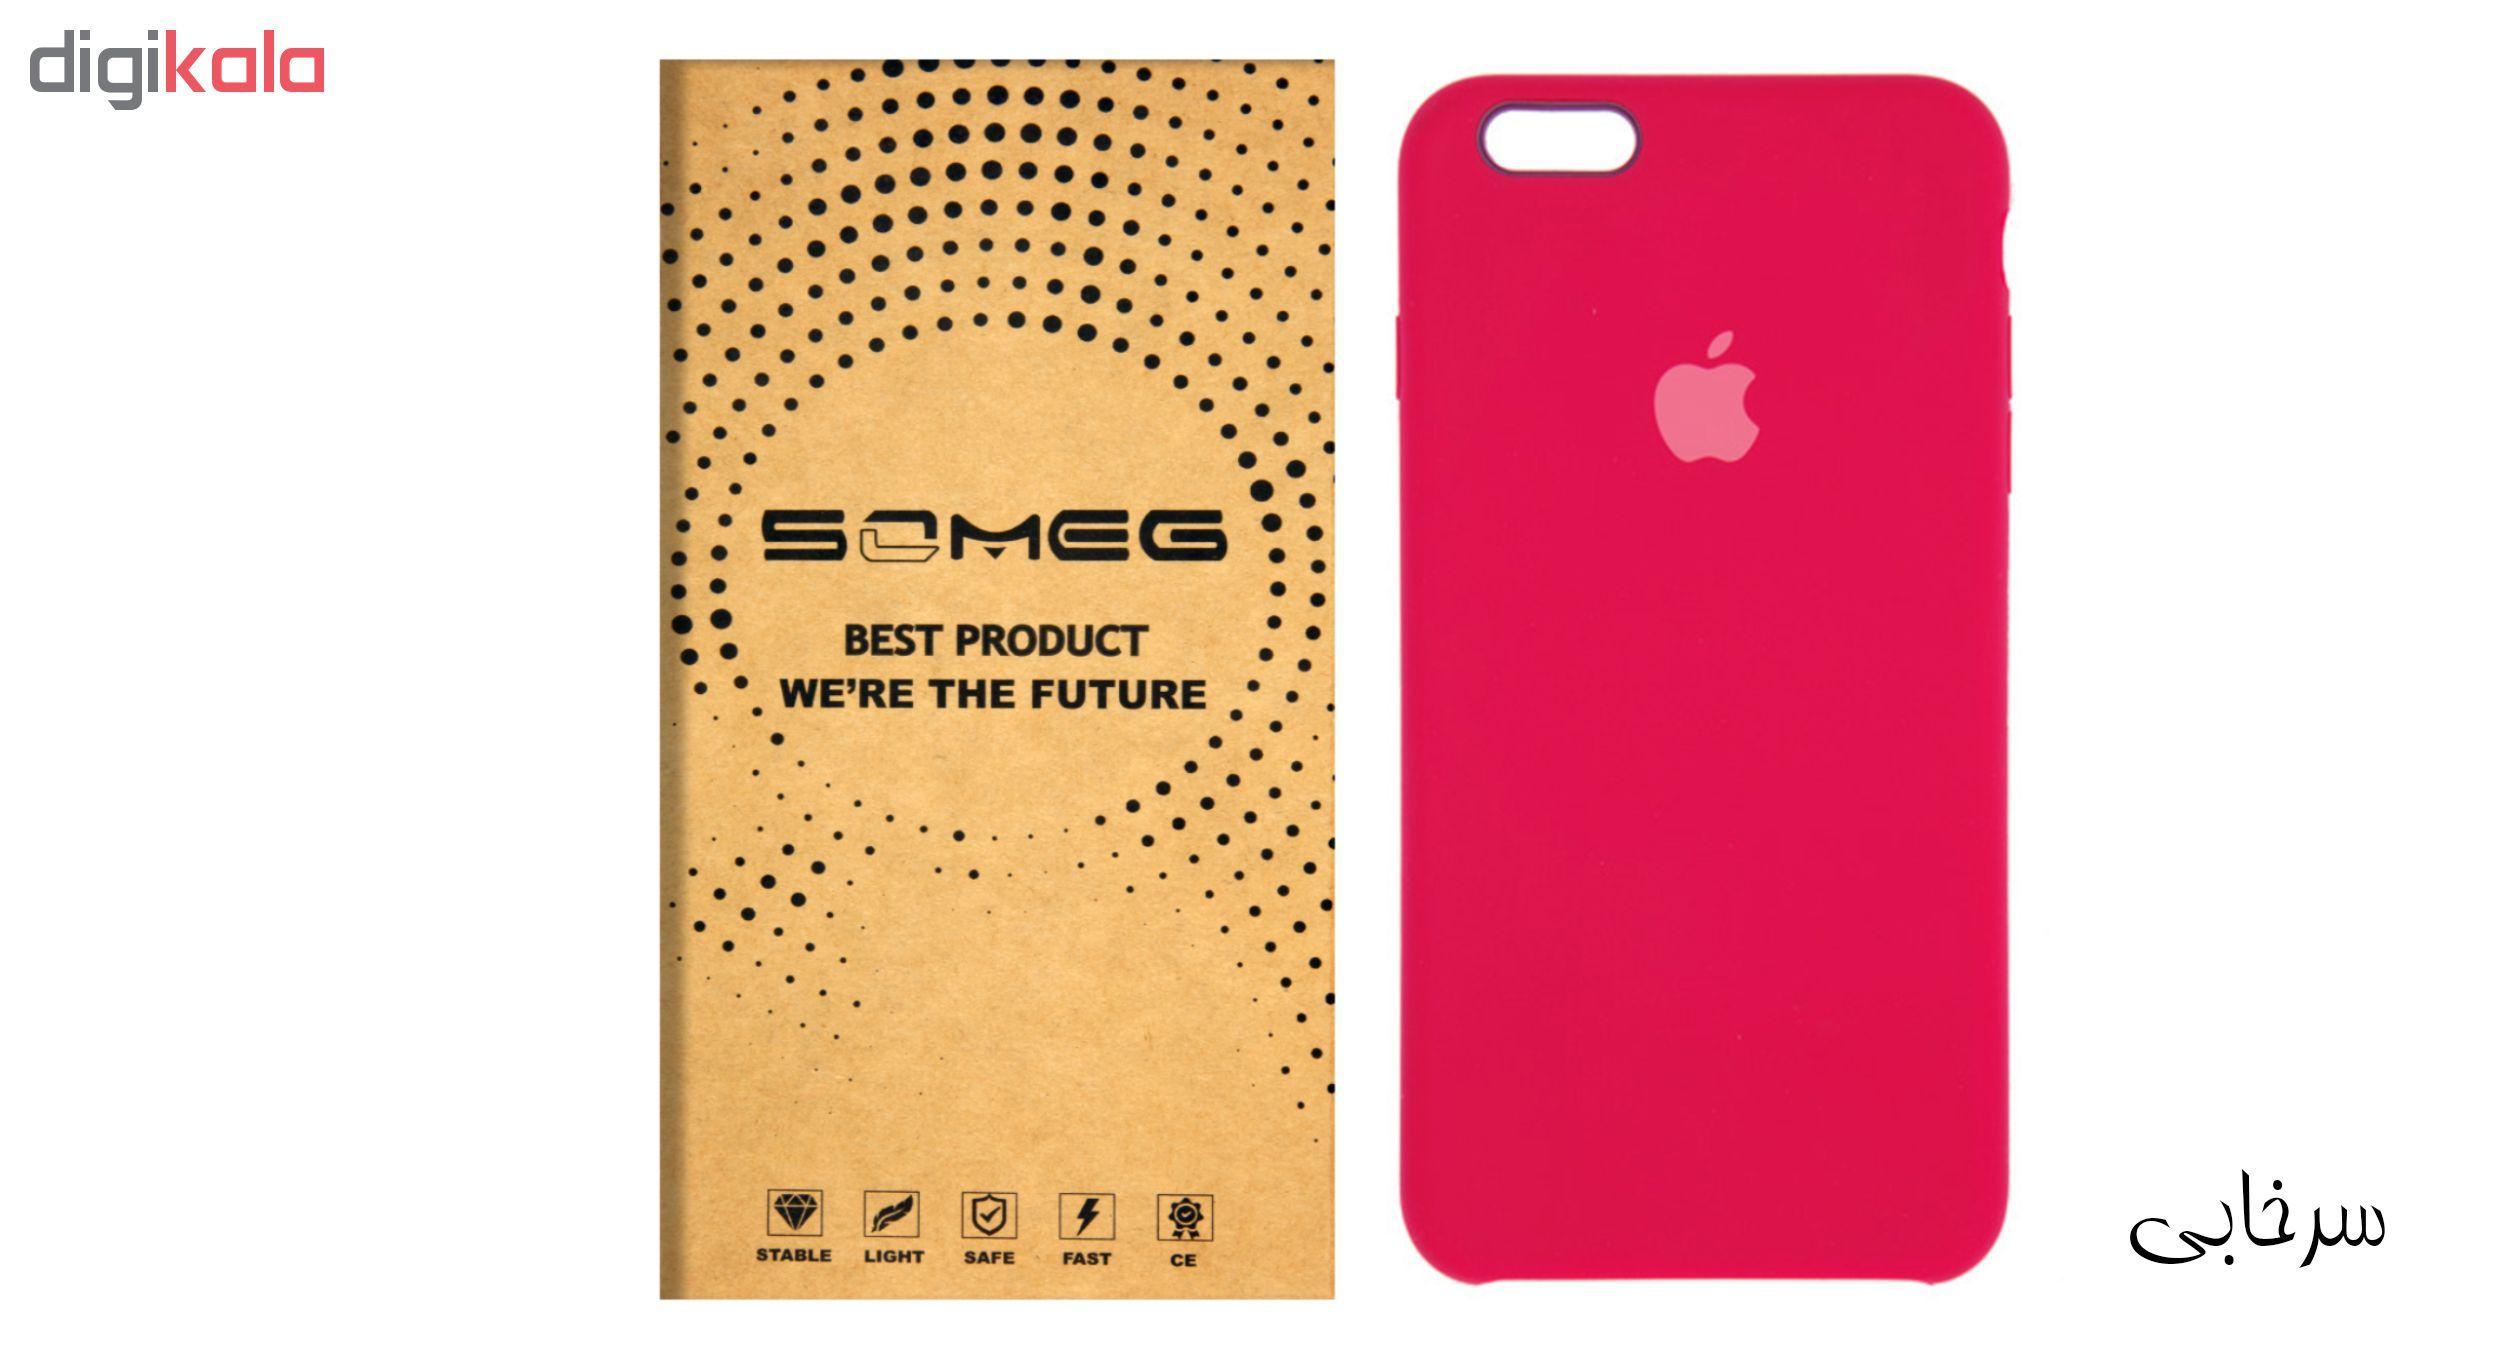 کاور سومگ مدل SIC مناسب برای گوشی موبایل اپل iPhone 6/6s main 1 22